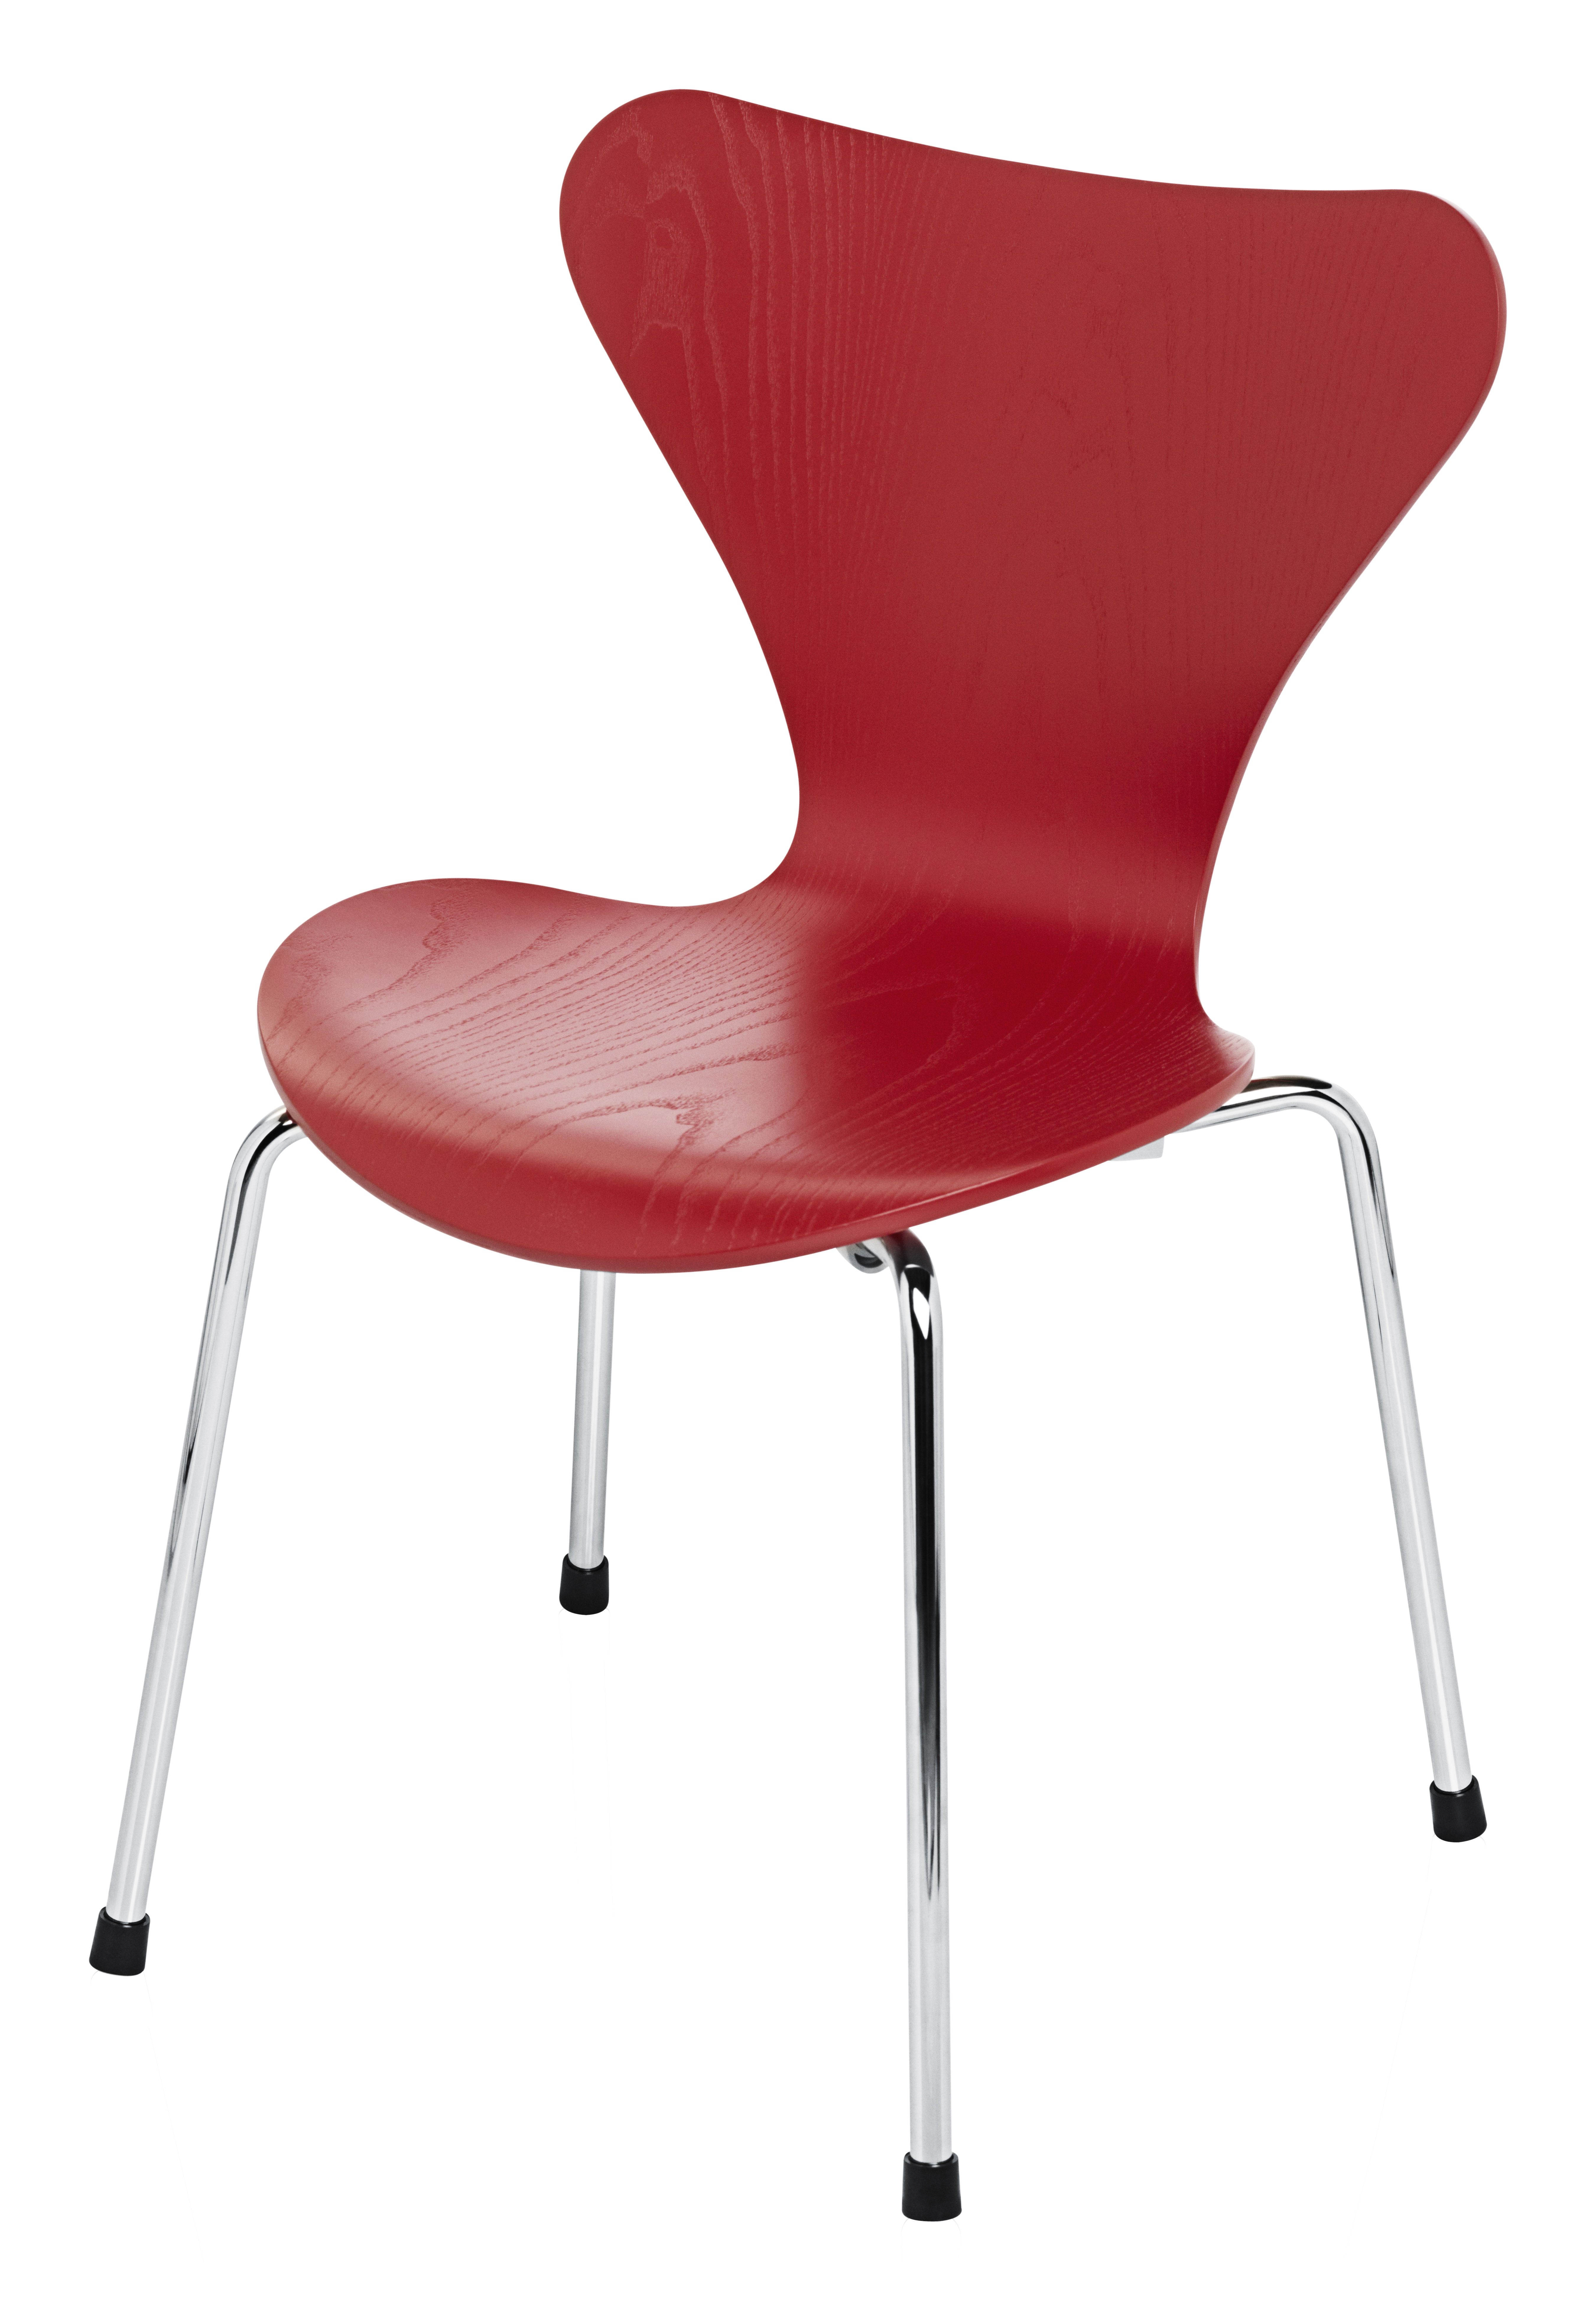 chaise enfant s rie 7 fr ne teint rouge fritz hansen. Black Bedroom Furniture Sets. Home Design Ideas